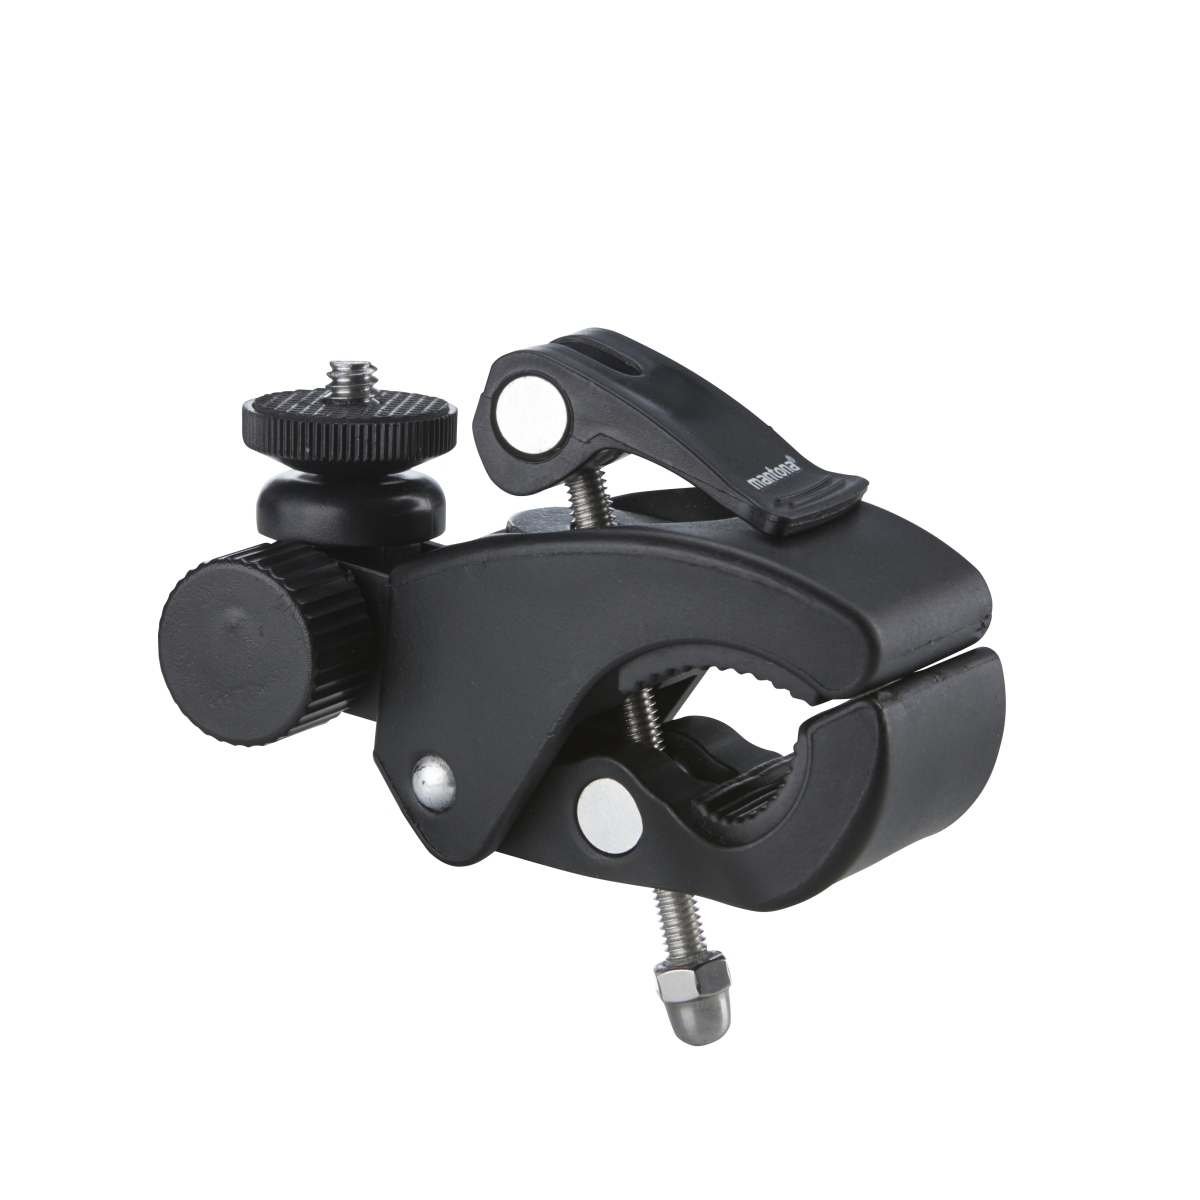 Mantona Clamp fixture XL 1,5-4cm GoPro + 1/4